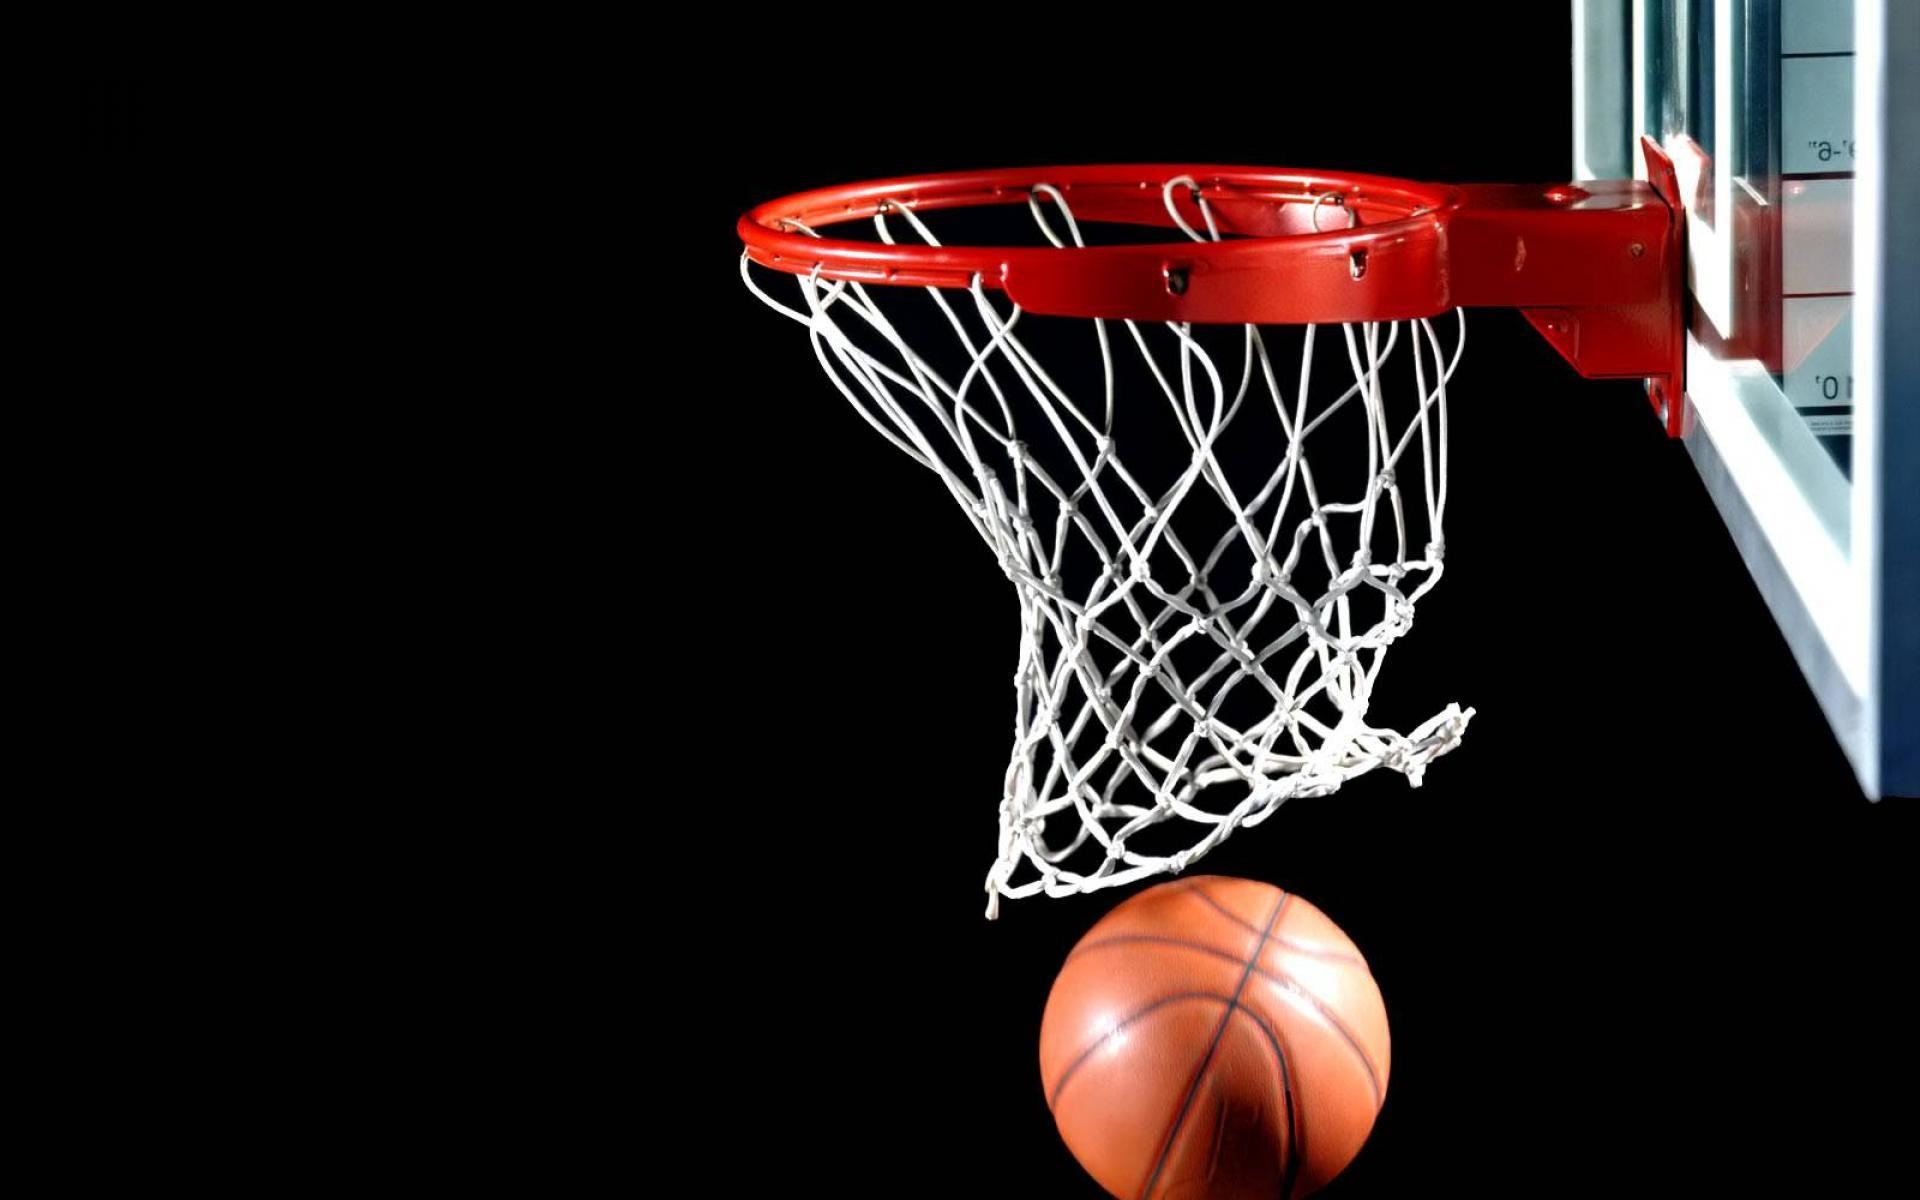 Basketball-HD-wallpaper-wpc9202786